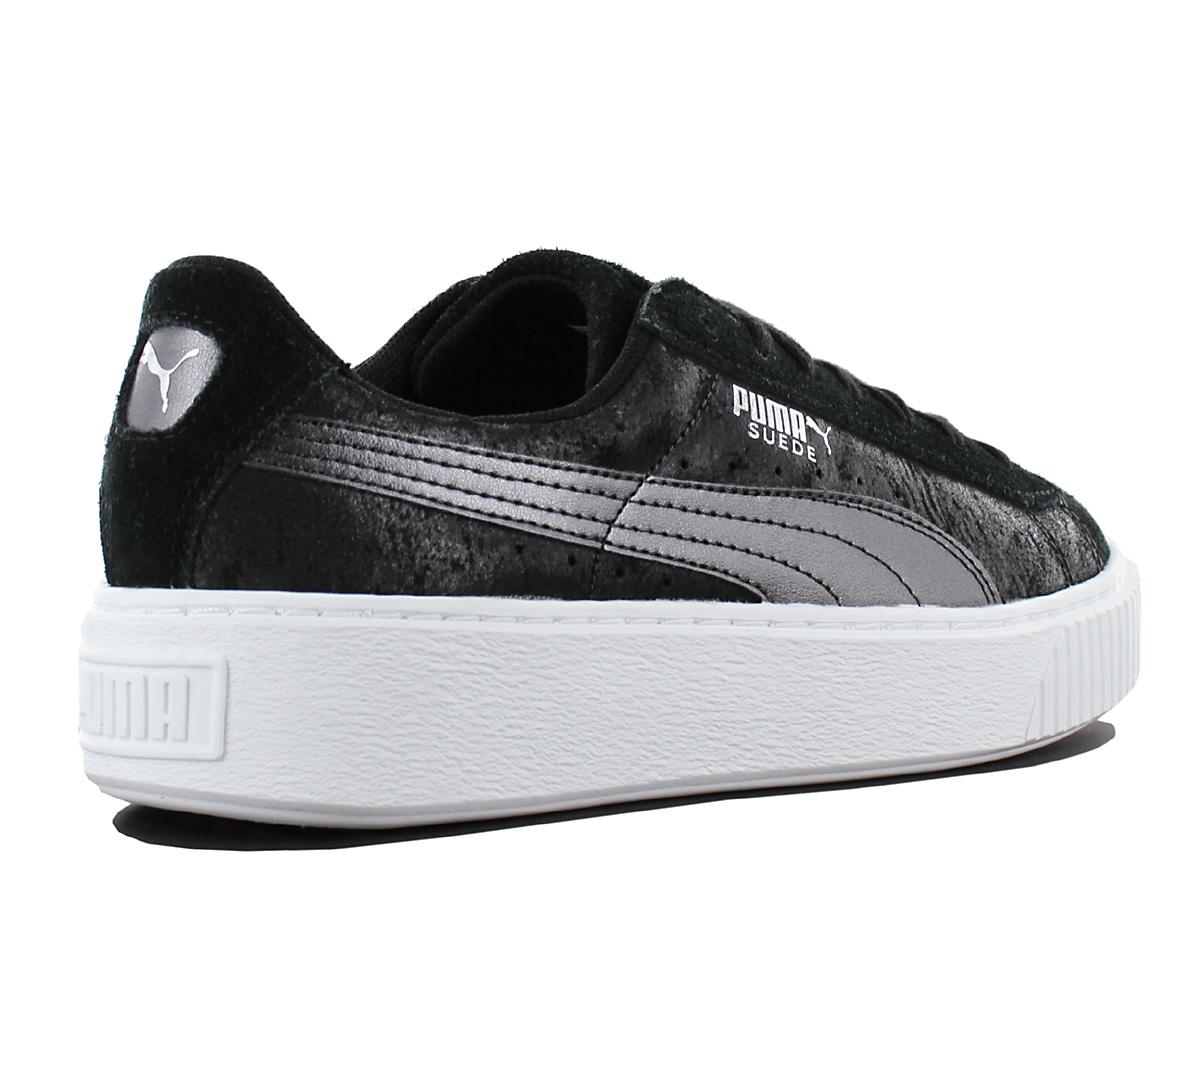 Puma Suede Platform Safari Ladies Sneaker Shoes Leisure Leather ... ac95813f7